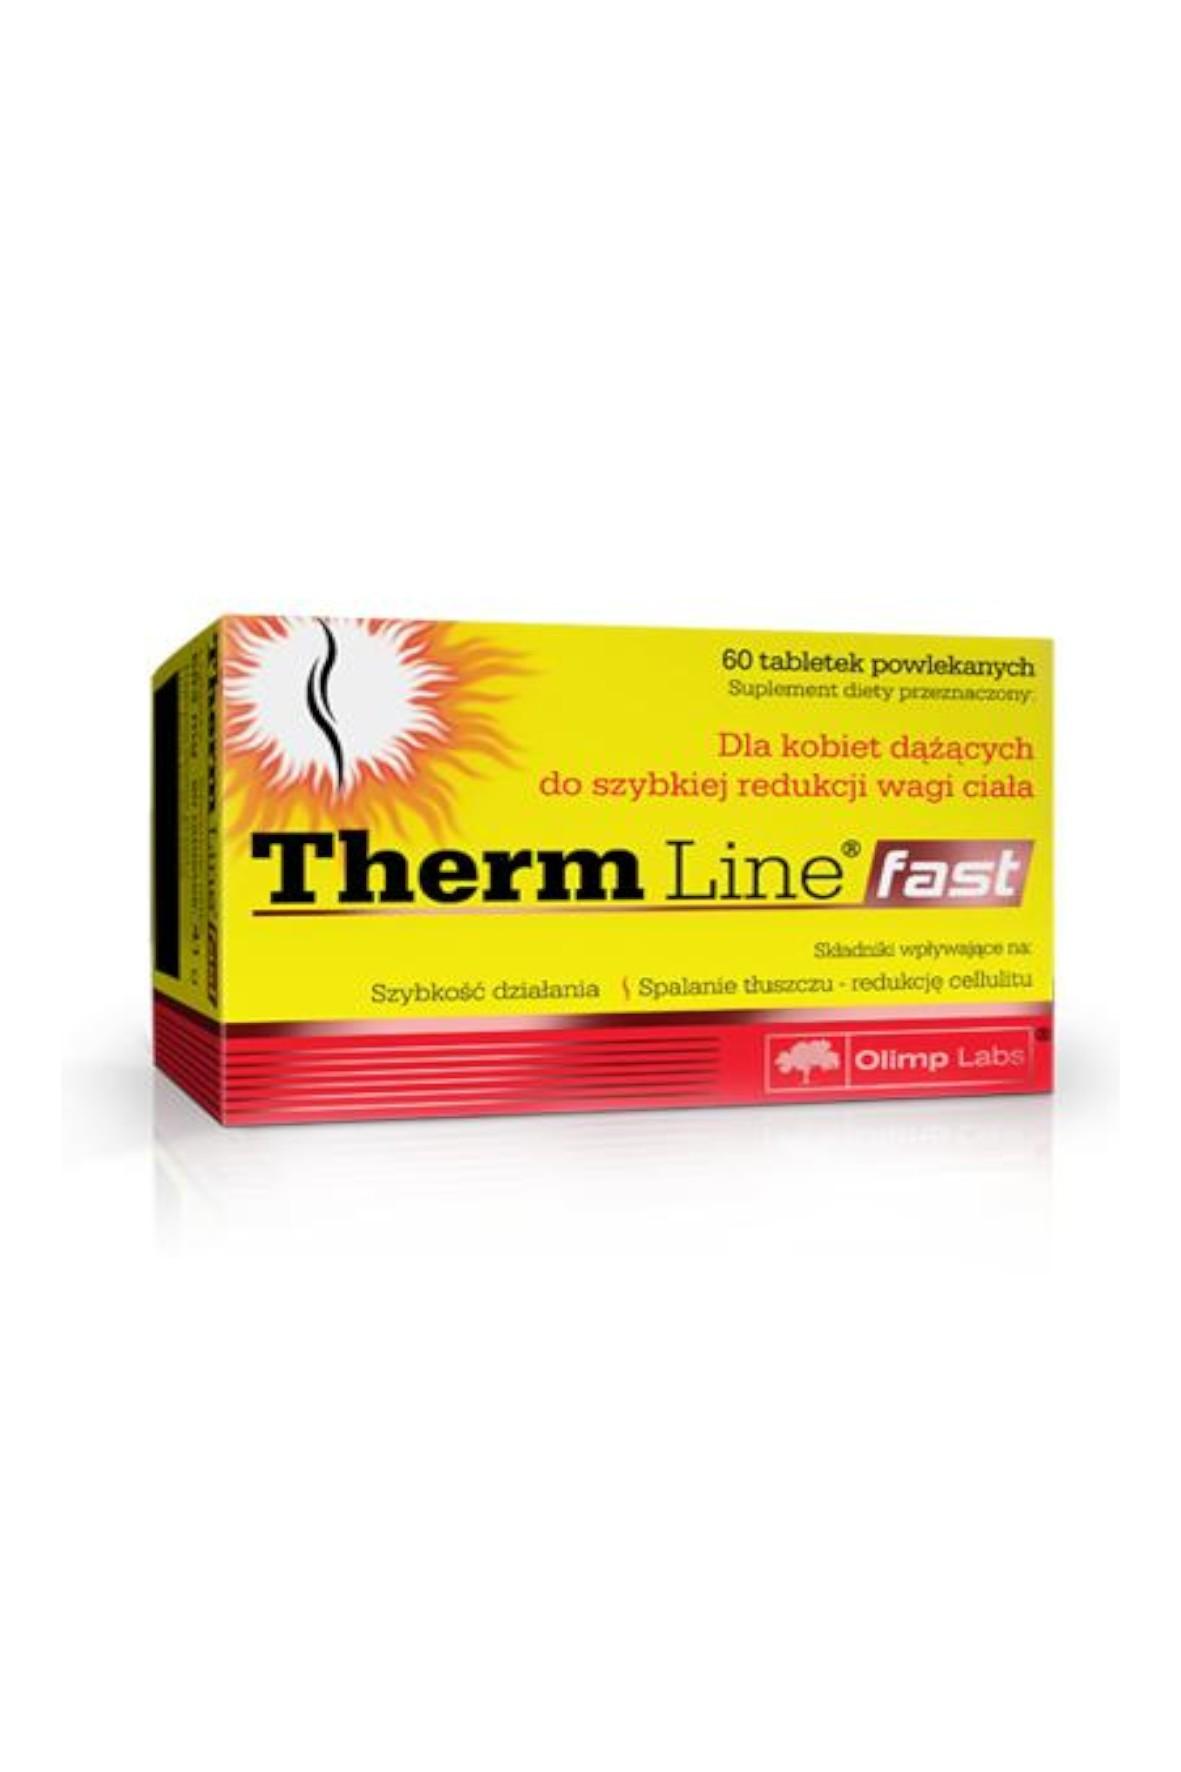 Therm Line fast - 60 tabletek